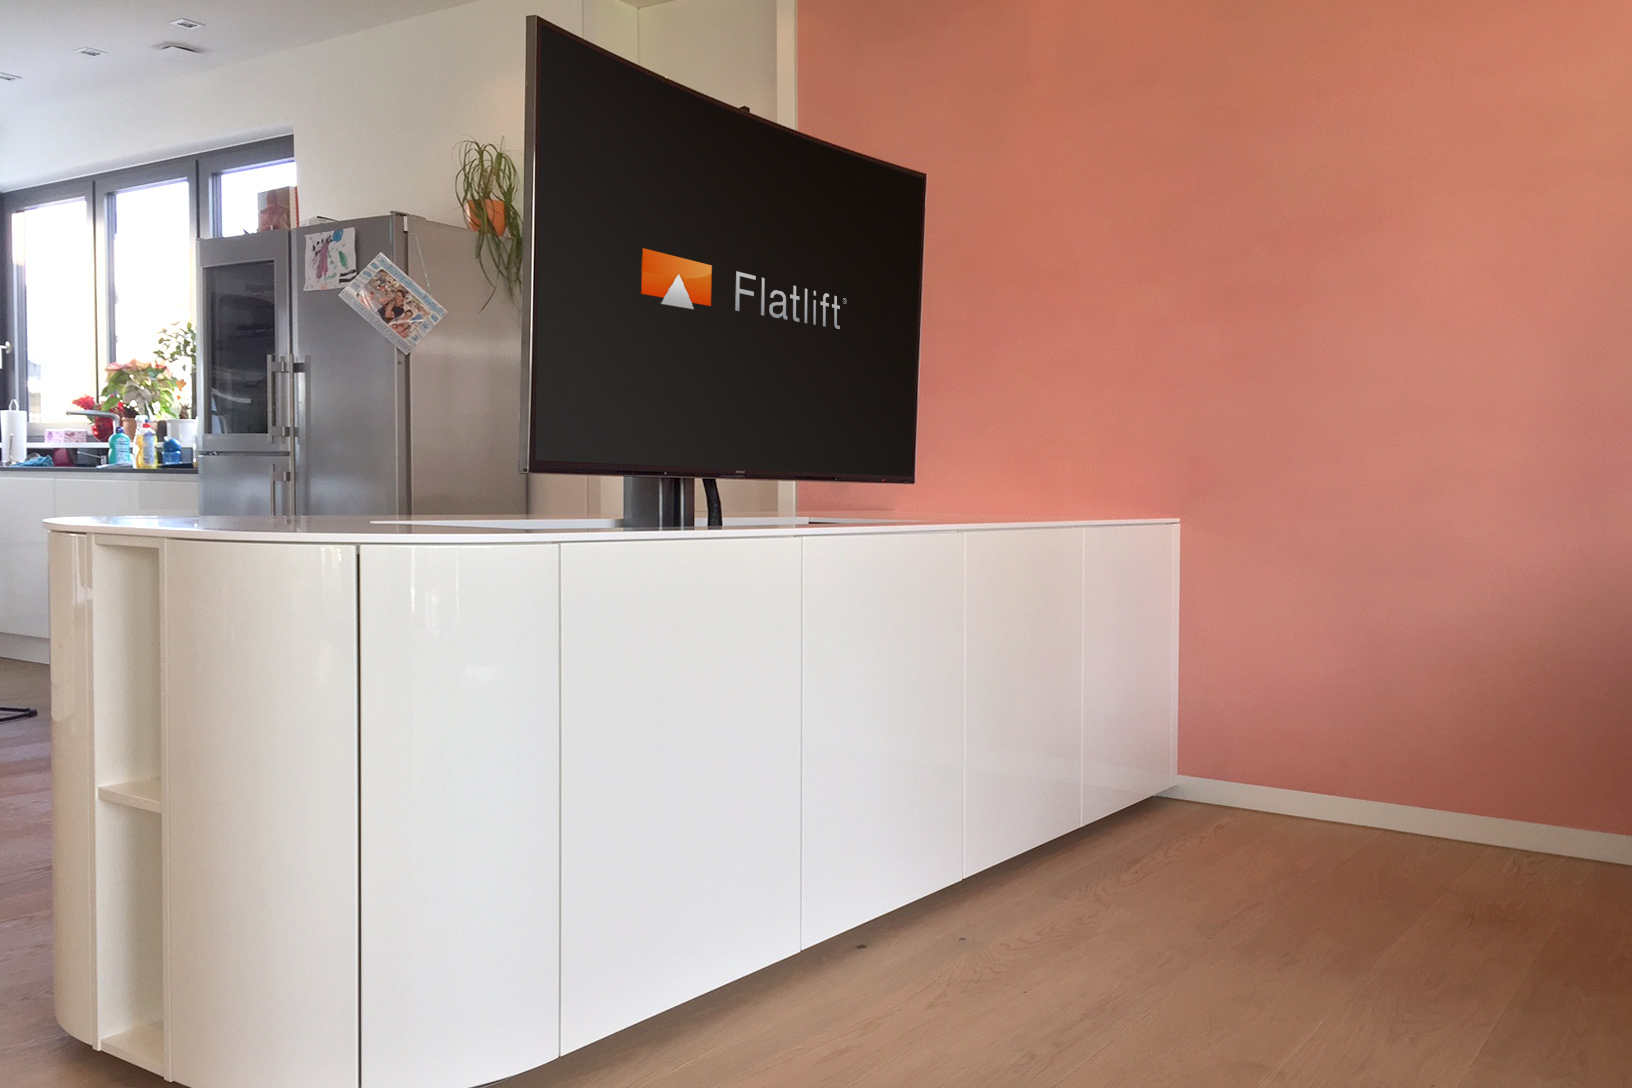 tv lifts flatlift budget tv lifts tv lifts flatlift budget tv lifts. Black Bedroom Furniture Sets. Home Design Ideas